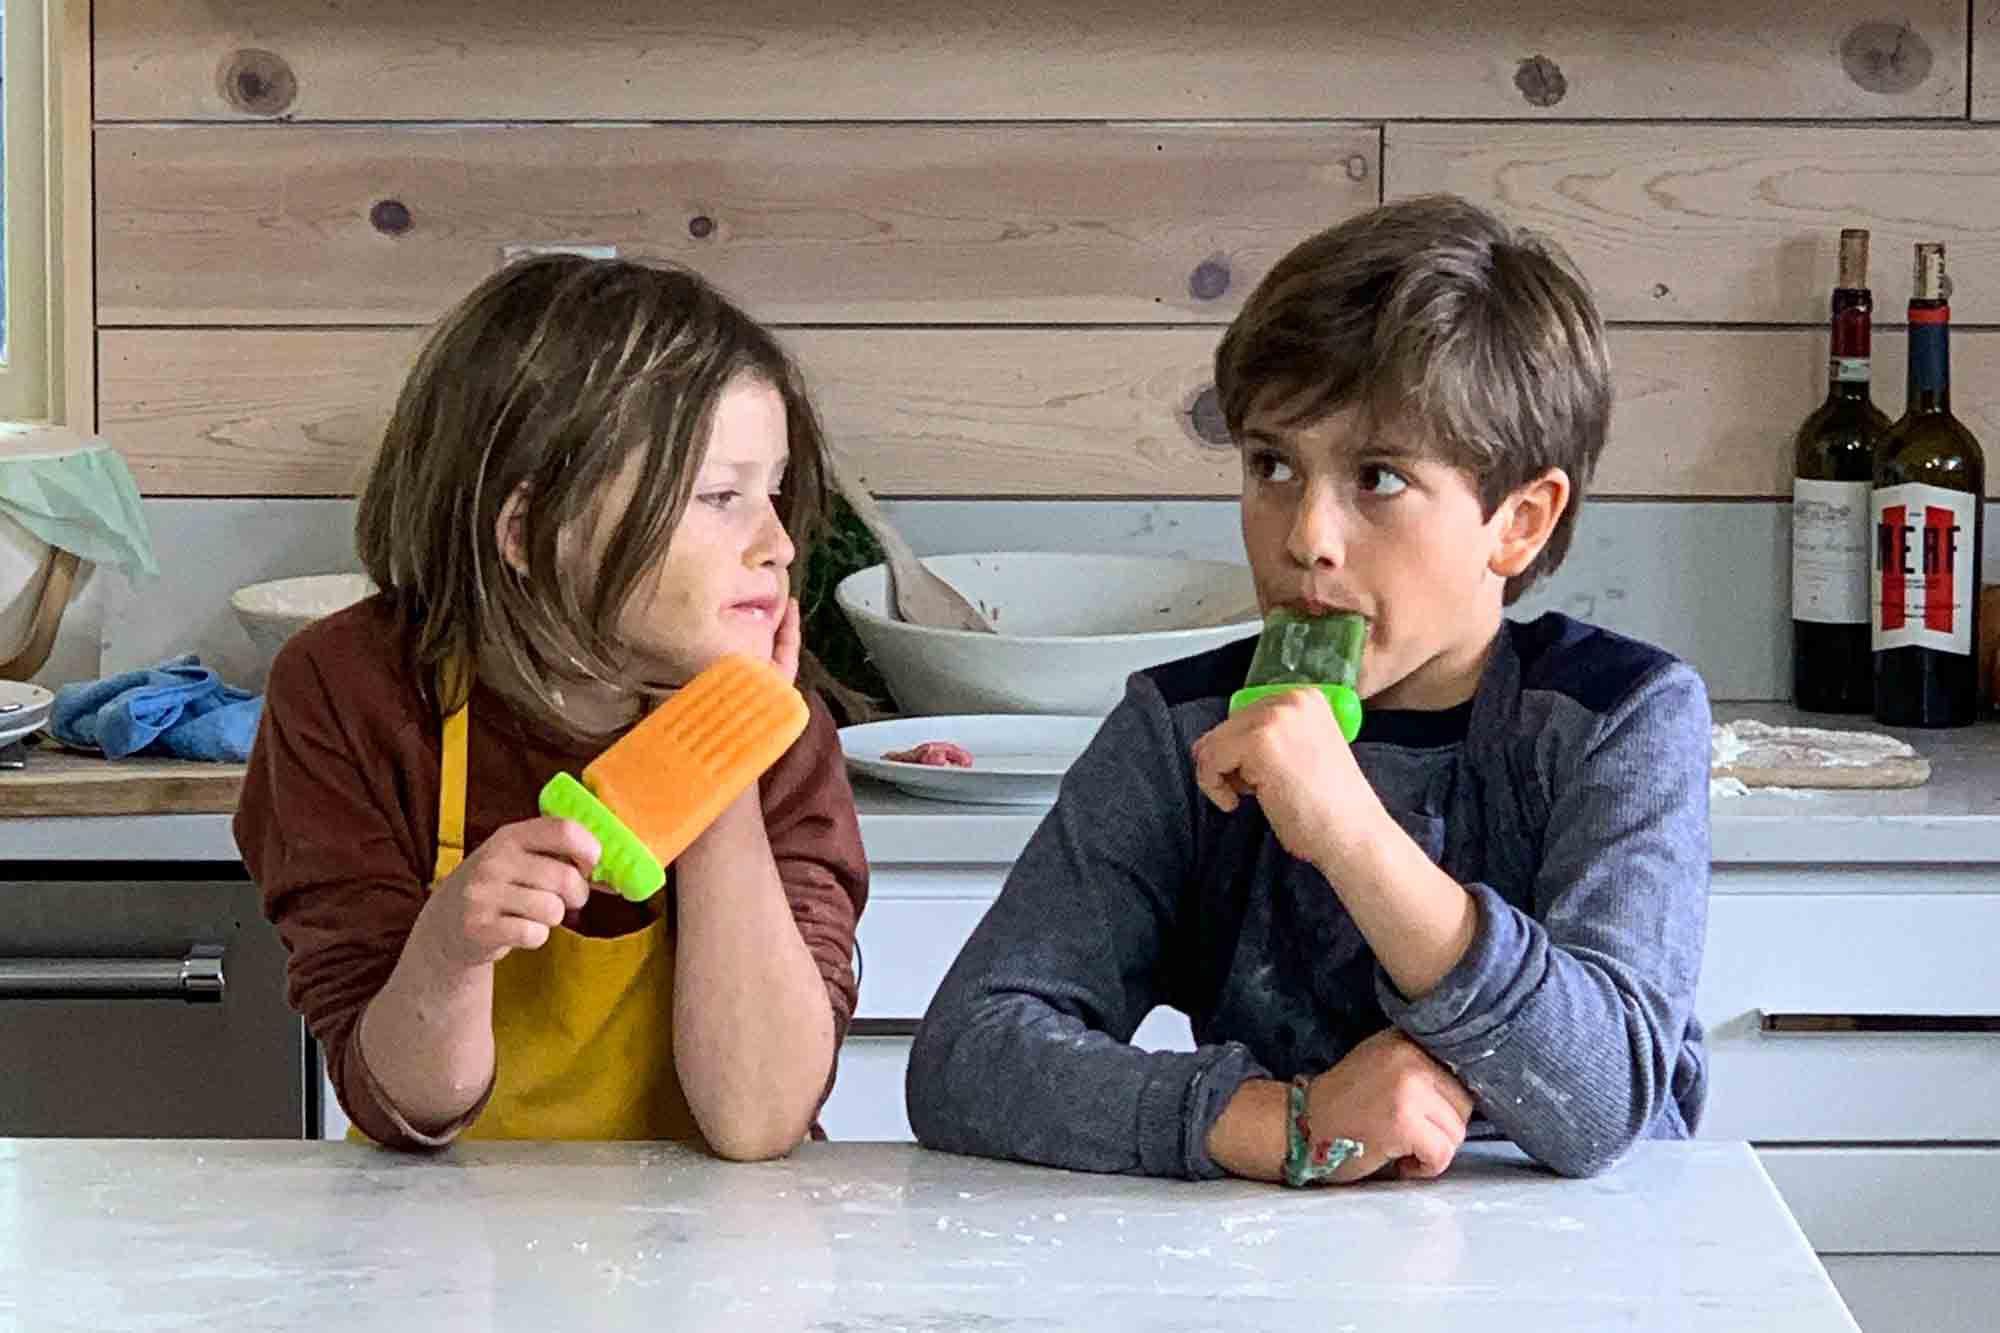 Misha Collins' kids eating popsicles